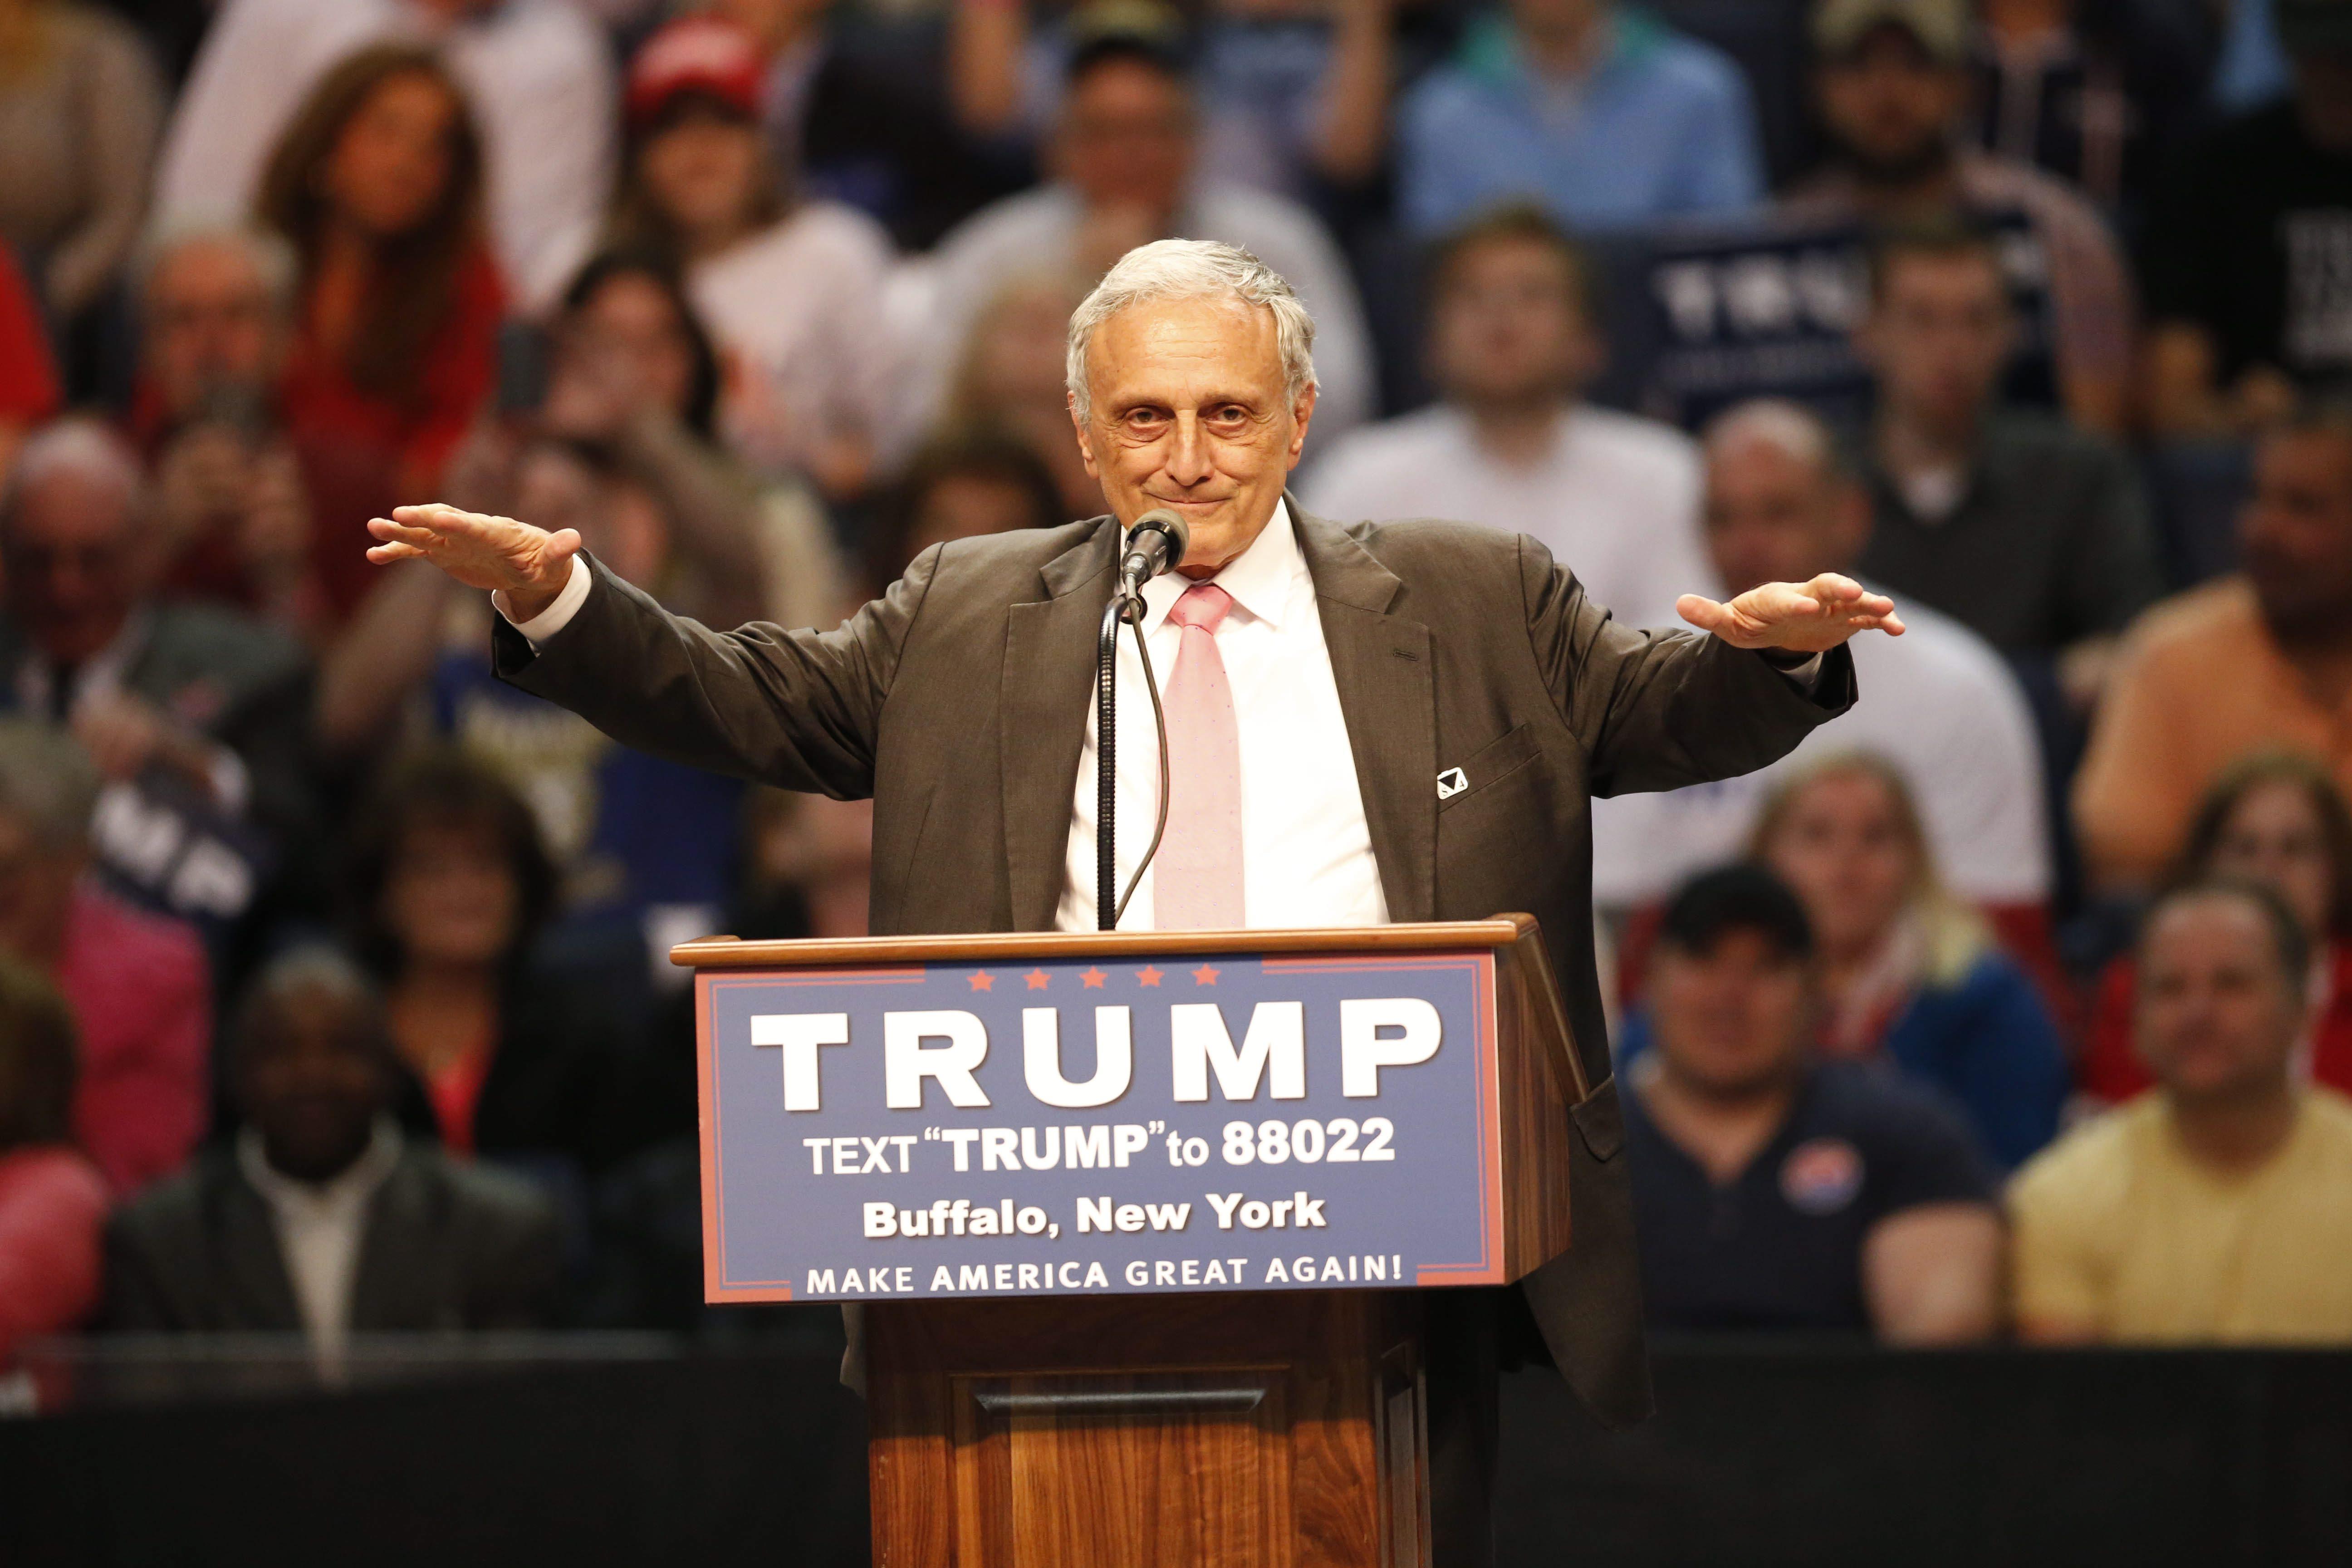 Carl Paladino speaks during the Trump rally at First Niagara Center in Buffalo on April 18, 2016. (Derek Gee/Buffalo News)